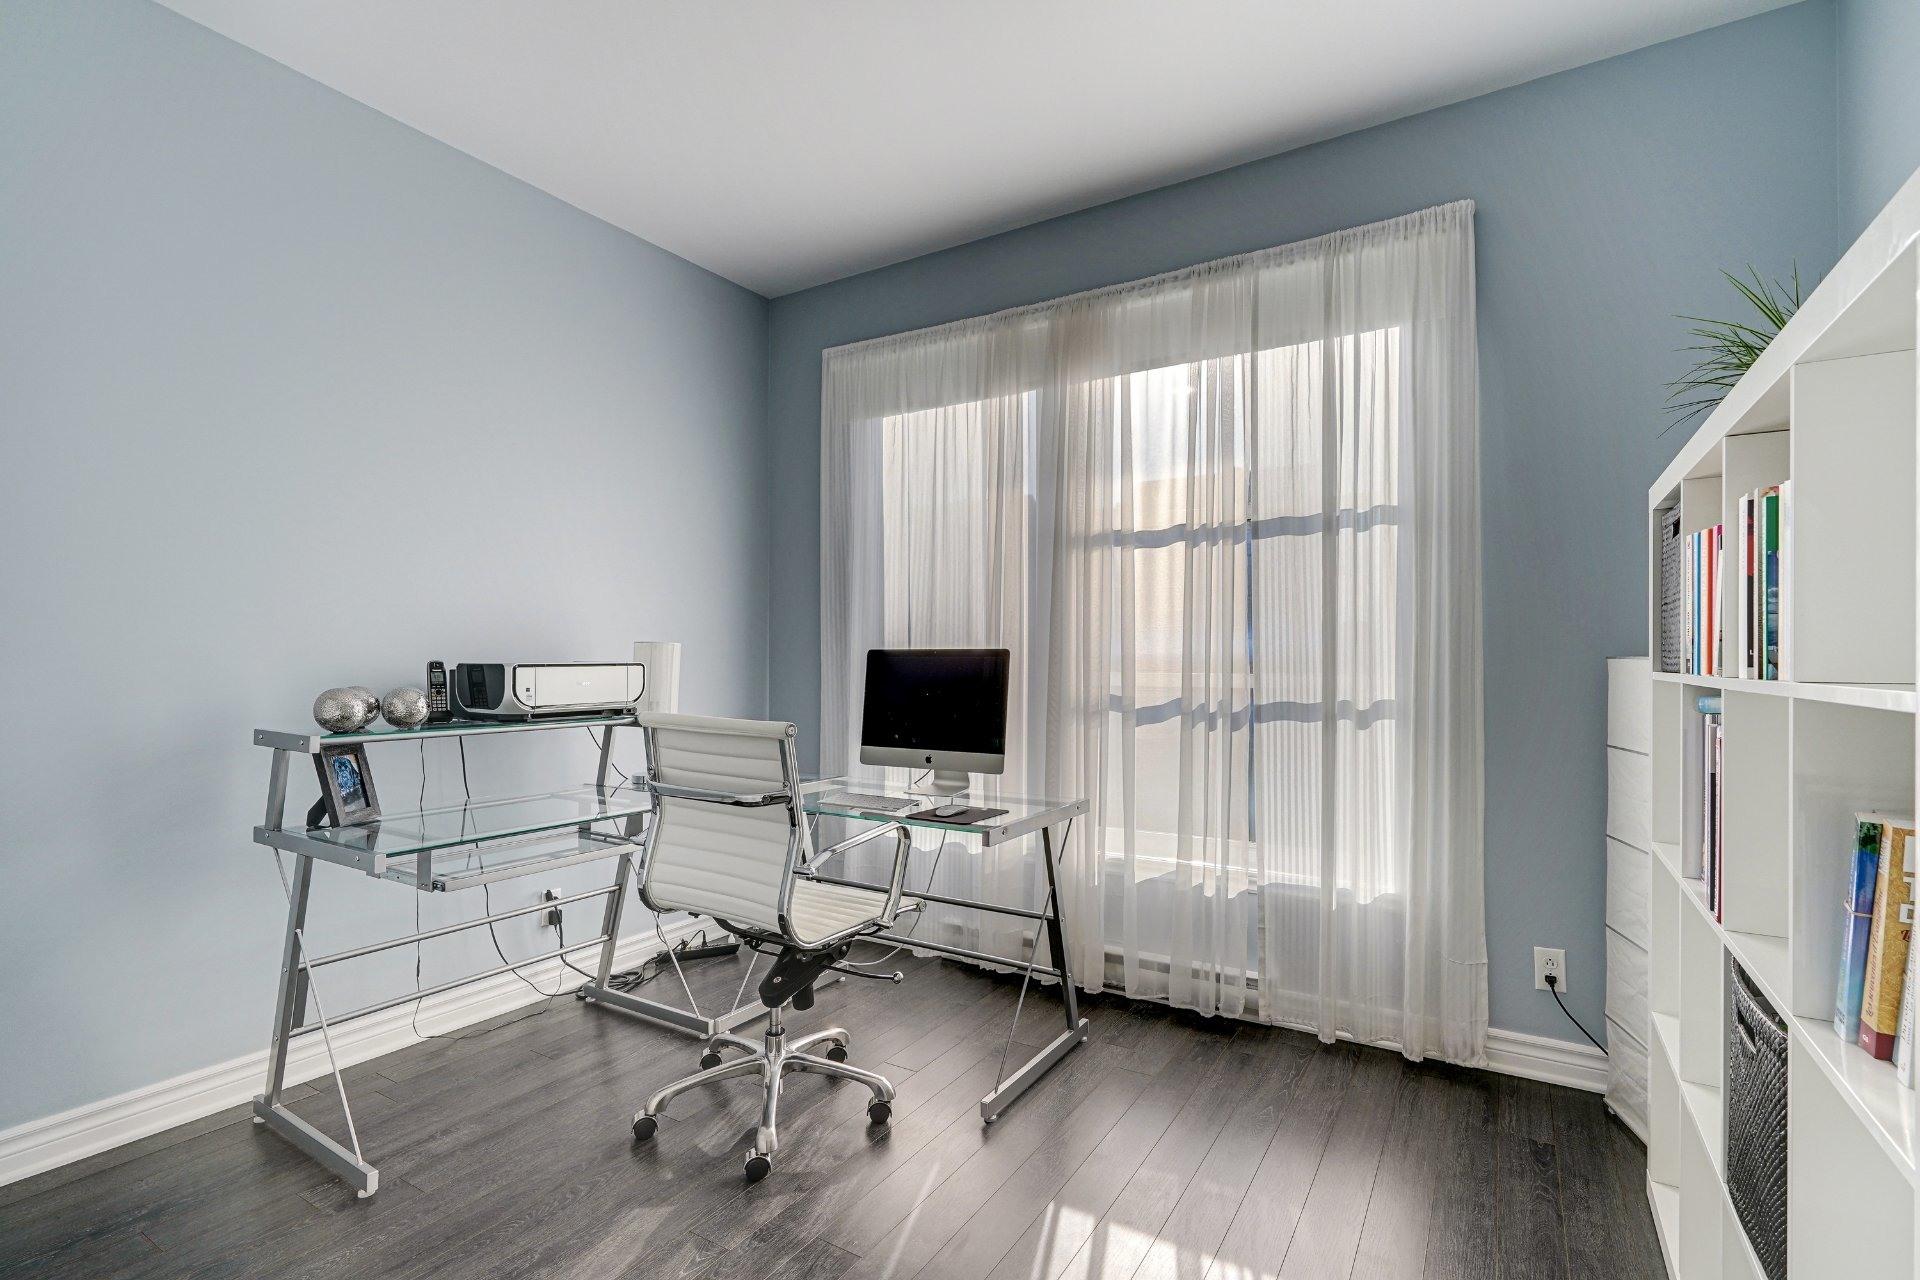 image 14 - Appartement À vendre Repentigny Repentigny  - 7 pièces